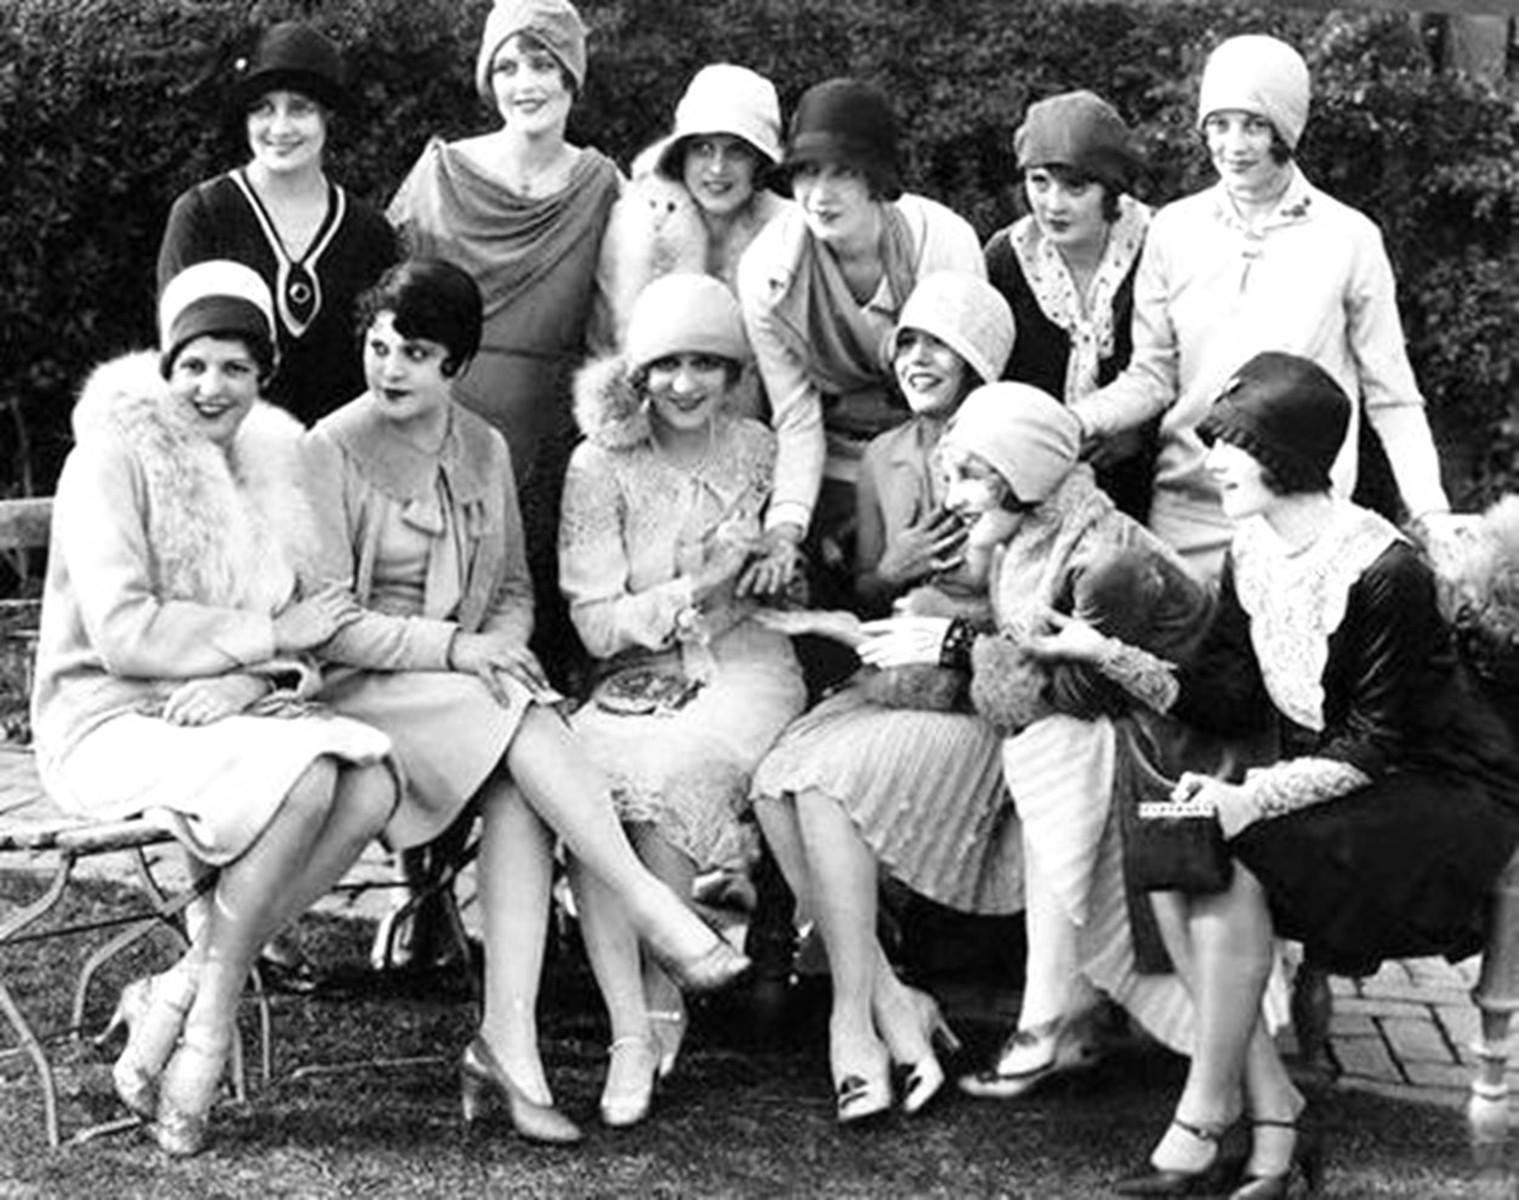 af40b93d816b Flappers: τα fashion icons της δεκαετίας του 1920 - Frapress